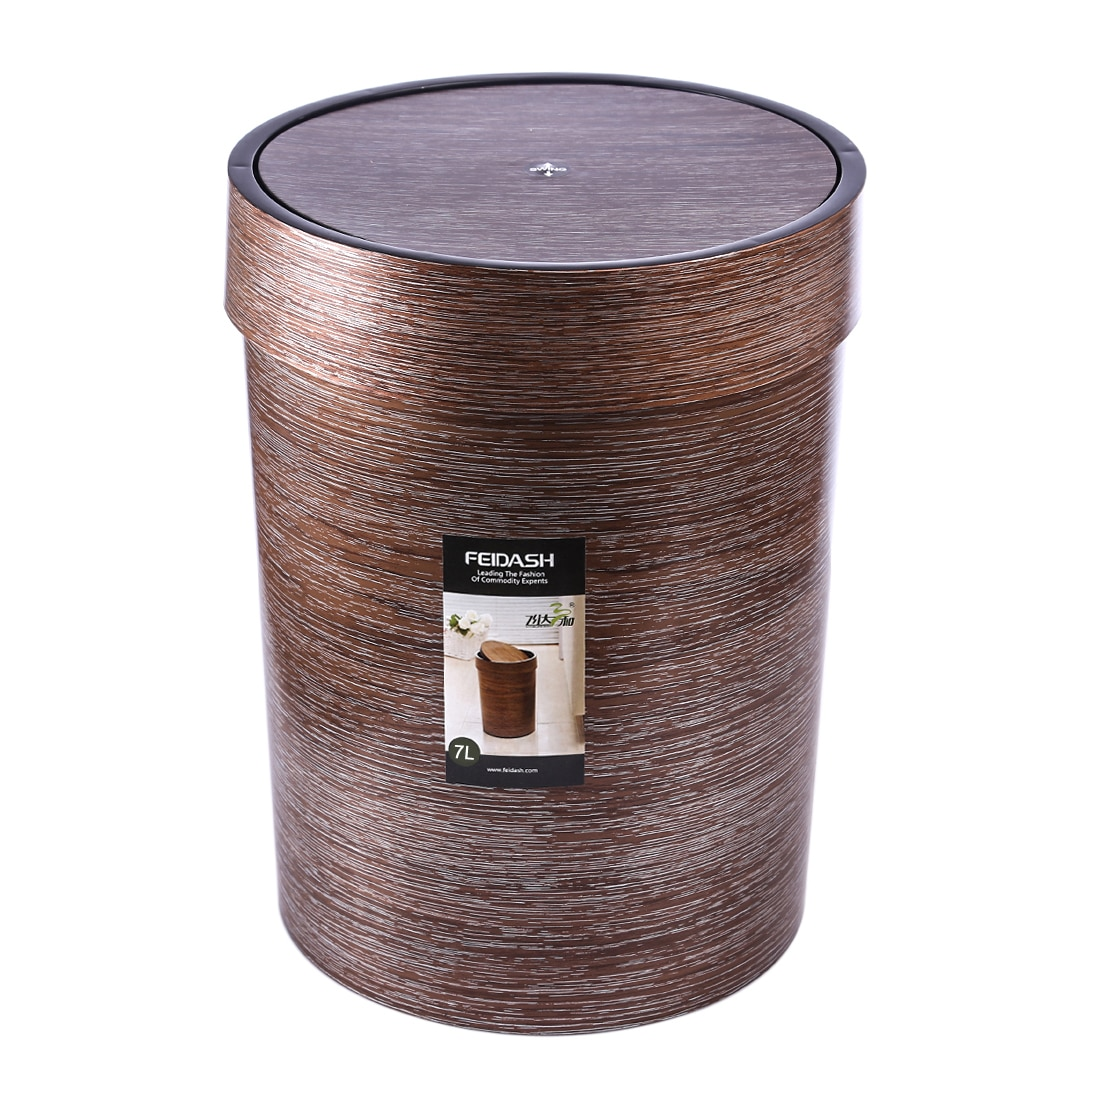 20.3 X 26.1cm 7L Household Plastic Roll Cover Trash Can Living Room Paper Basket Kitchen Storage Bucket Garbage Bag Dispenser